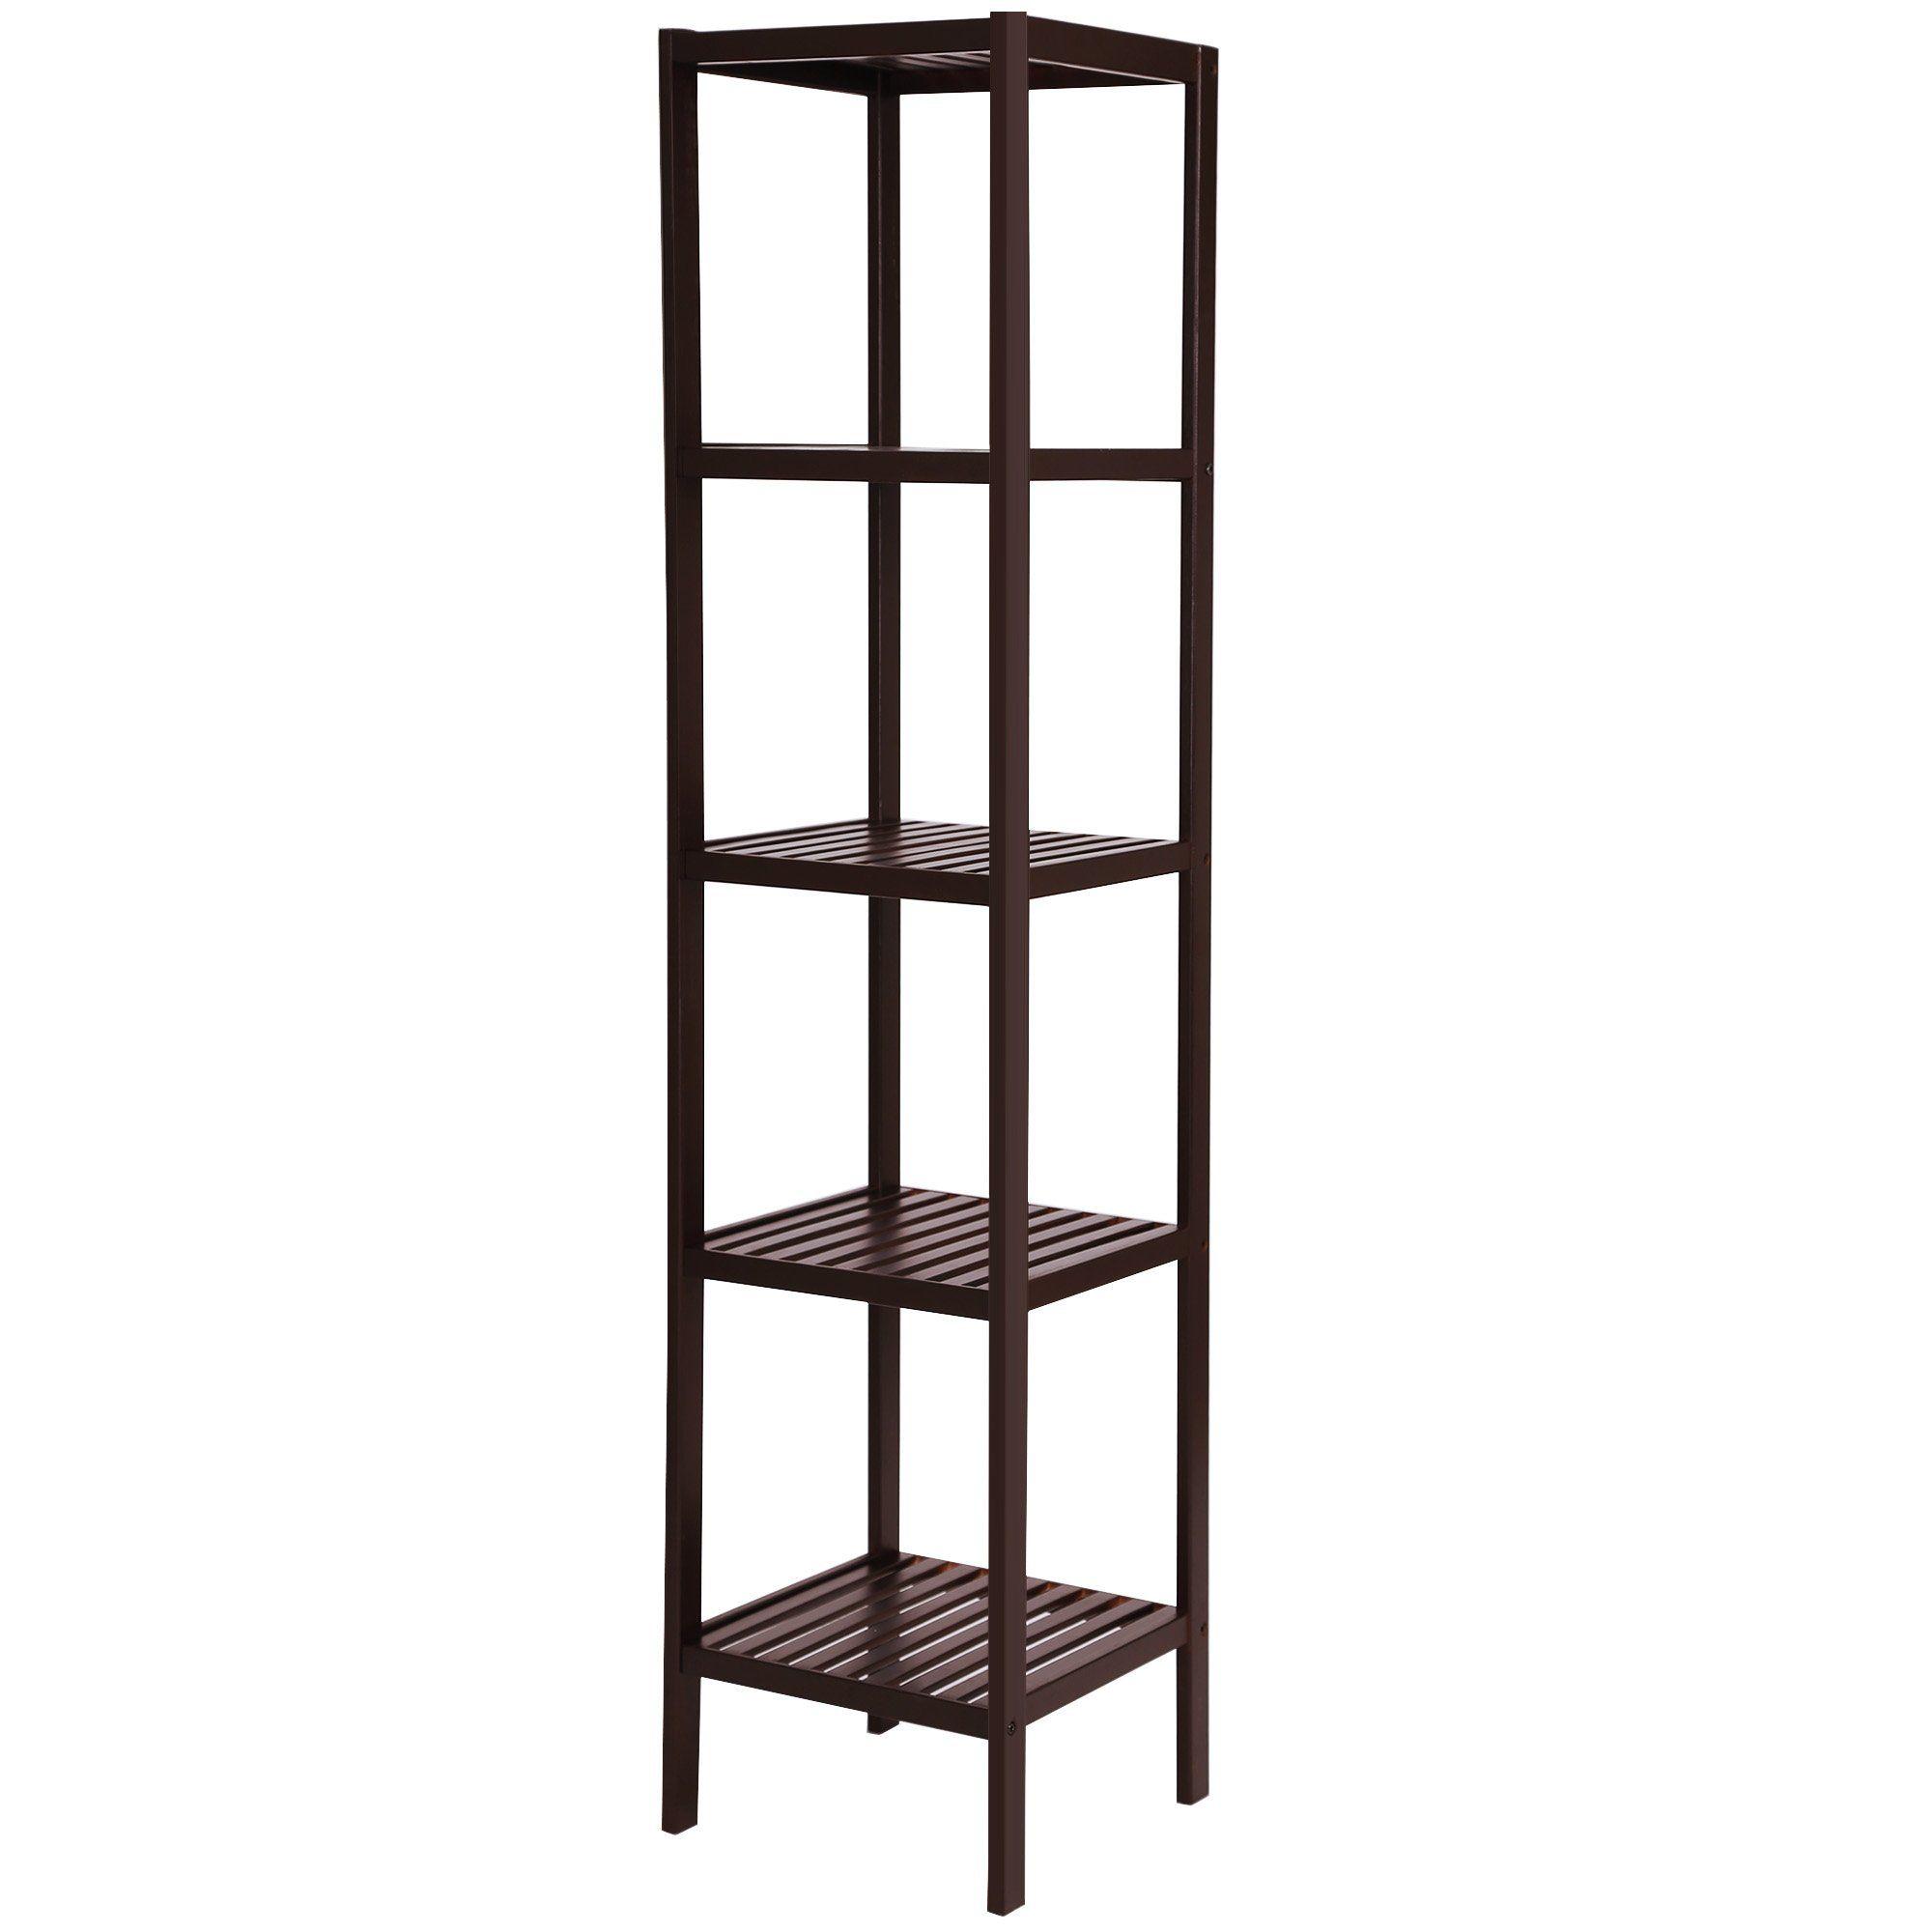 SONGMICS 100% Bamboo Bathroom Shelf 5-Tier Multifunctional Storage ...